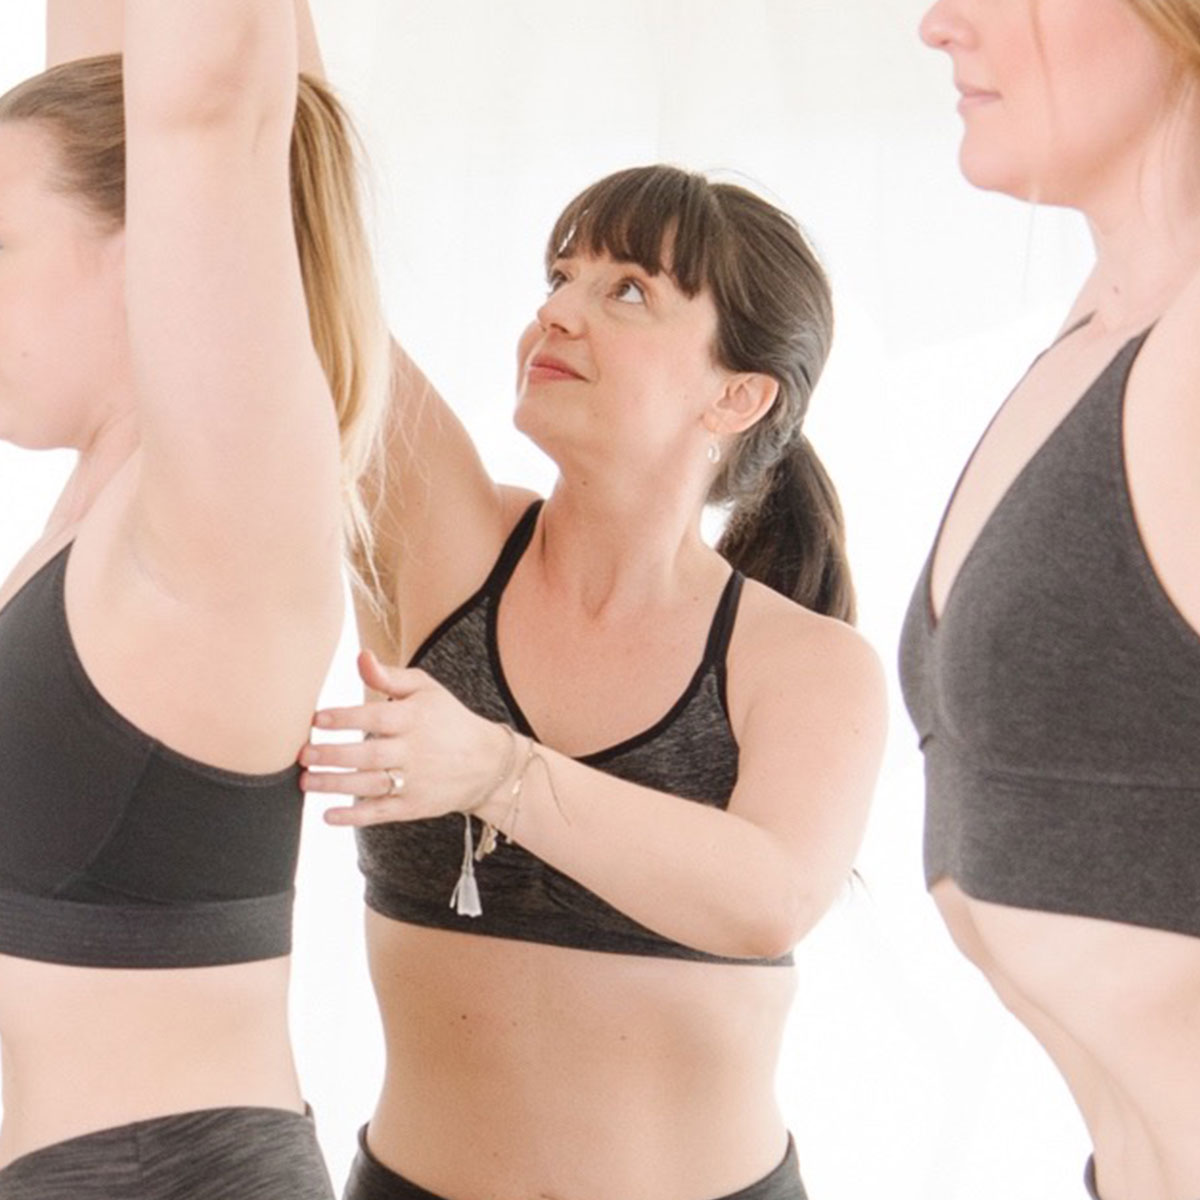 Sadie Lawler, hypopressives master trainer